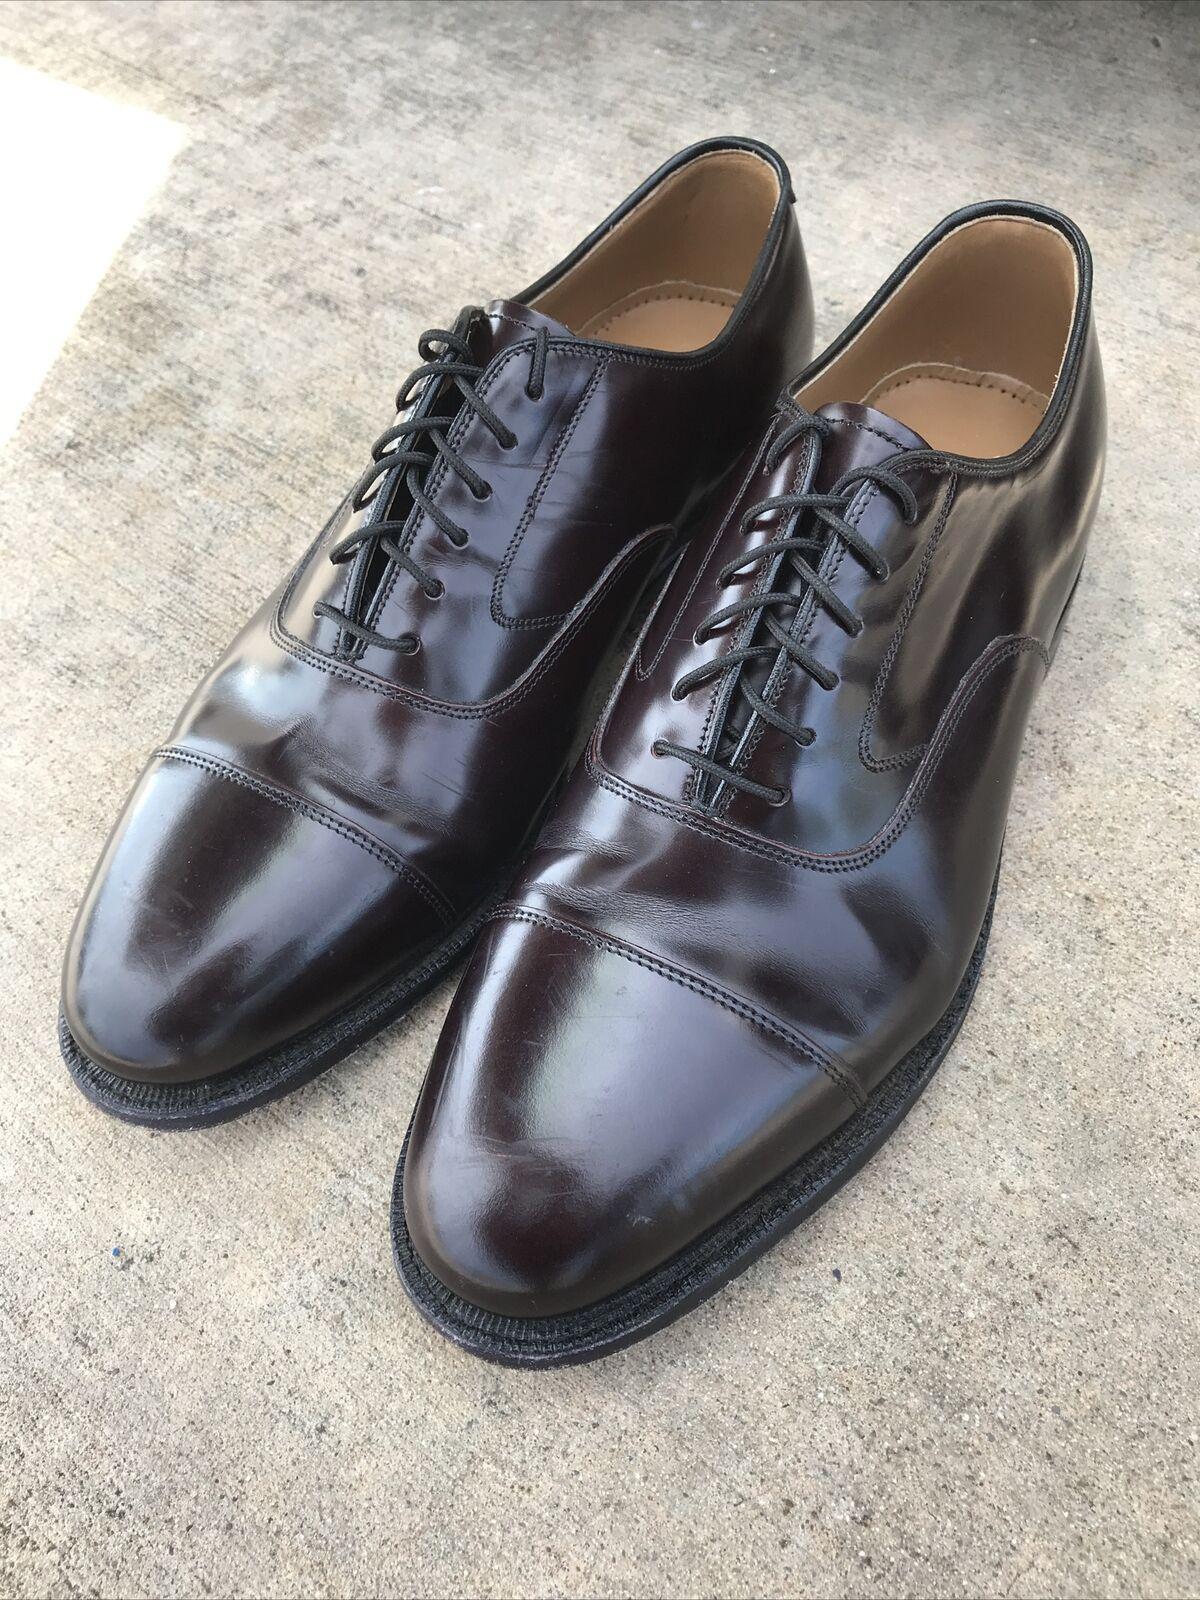 Johnston Murphy Mens Cordovan Leather Cap-Toe Ox Dress Shoe US 9 D